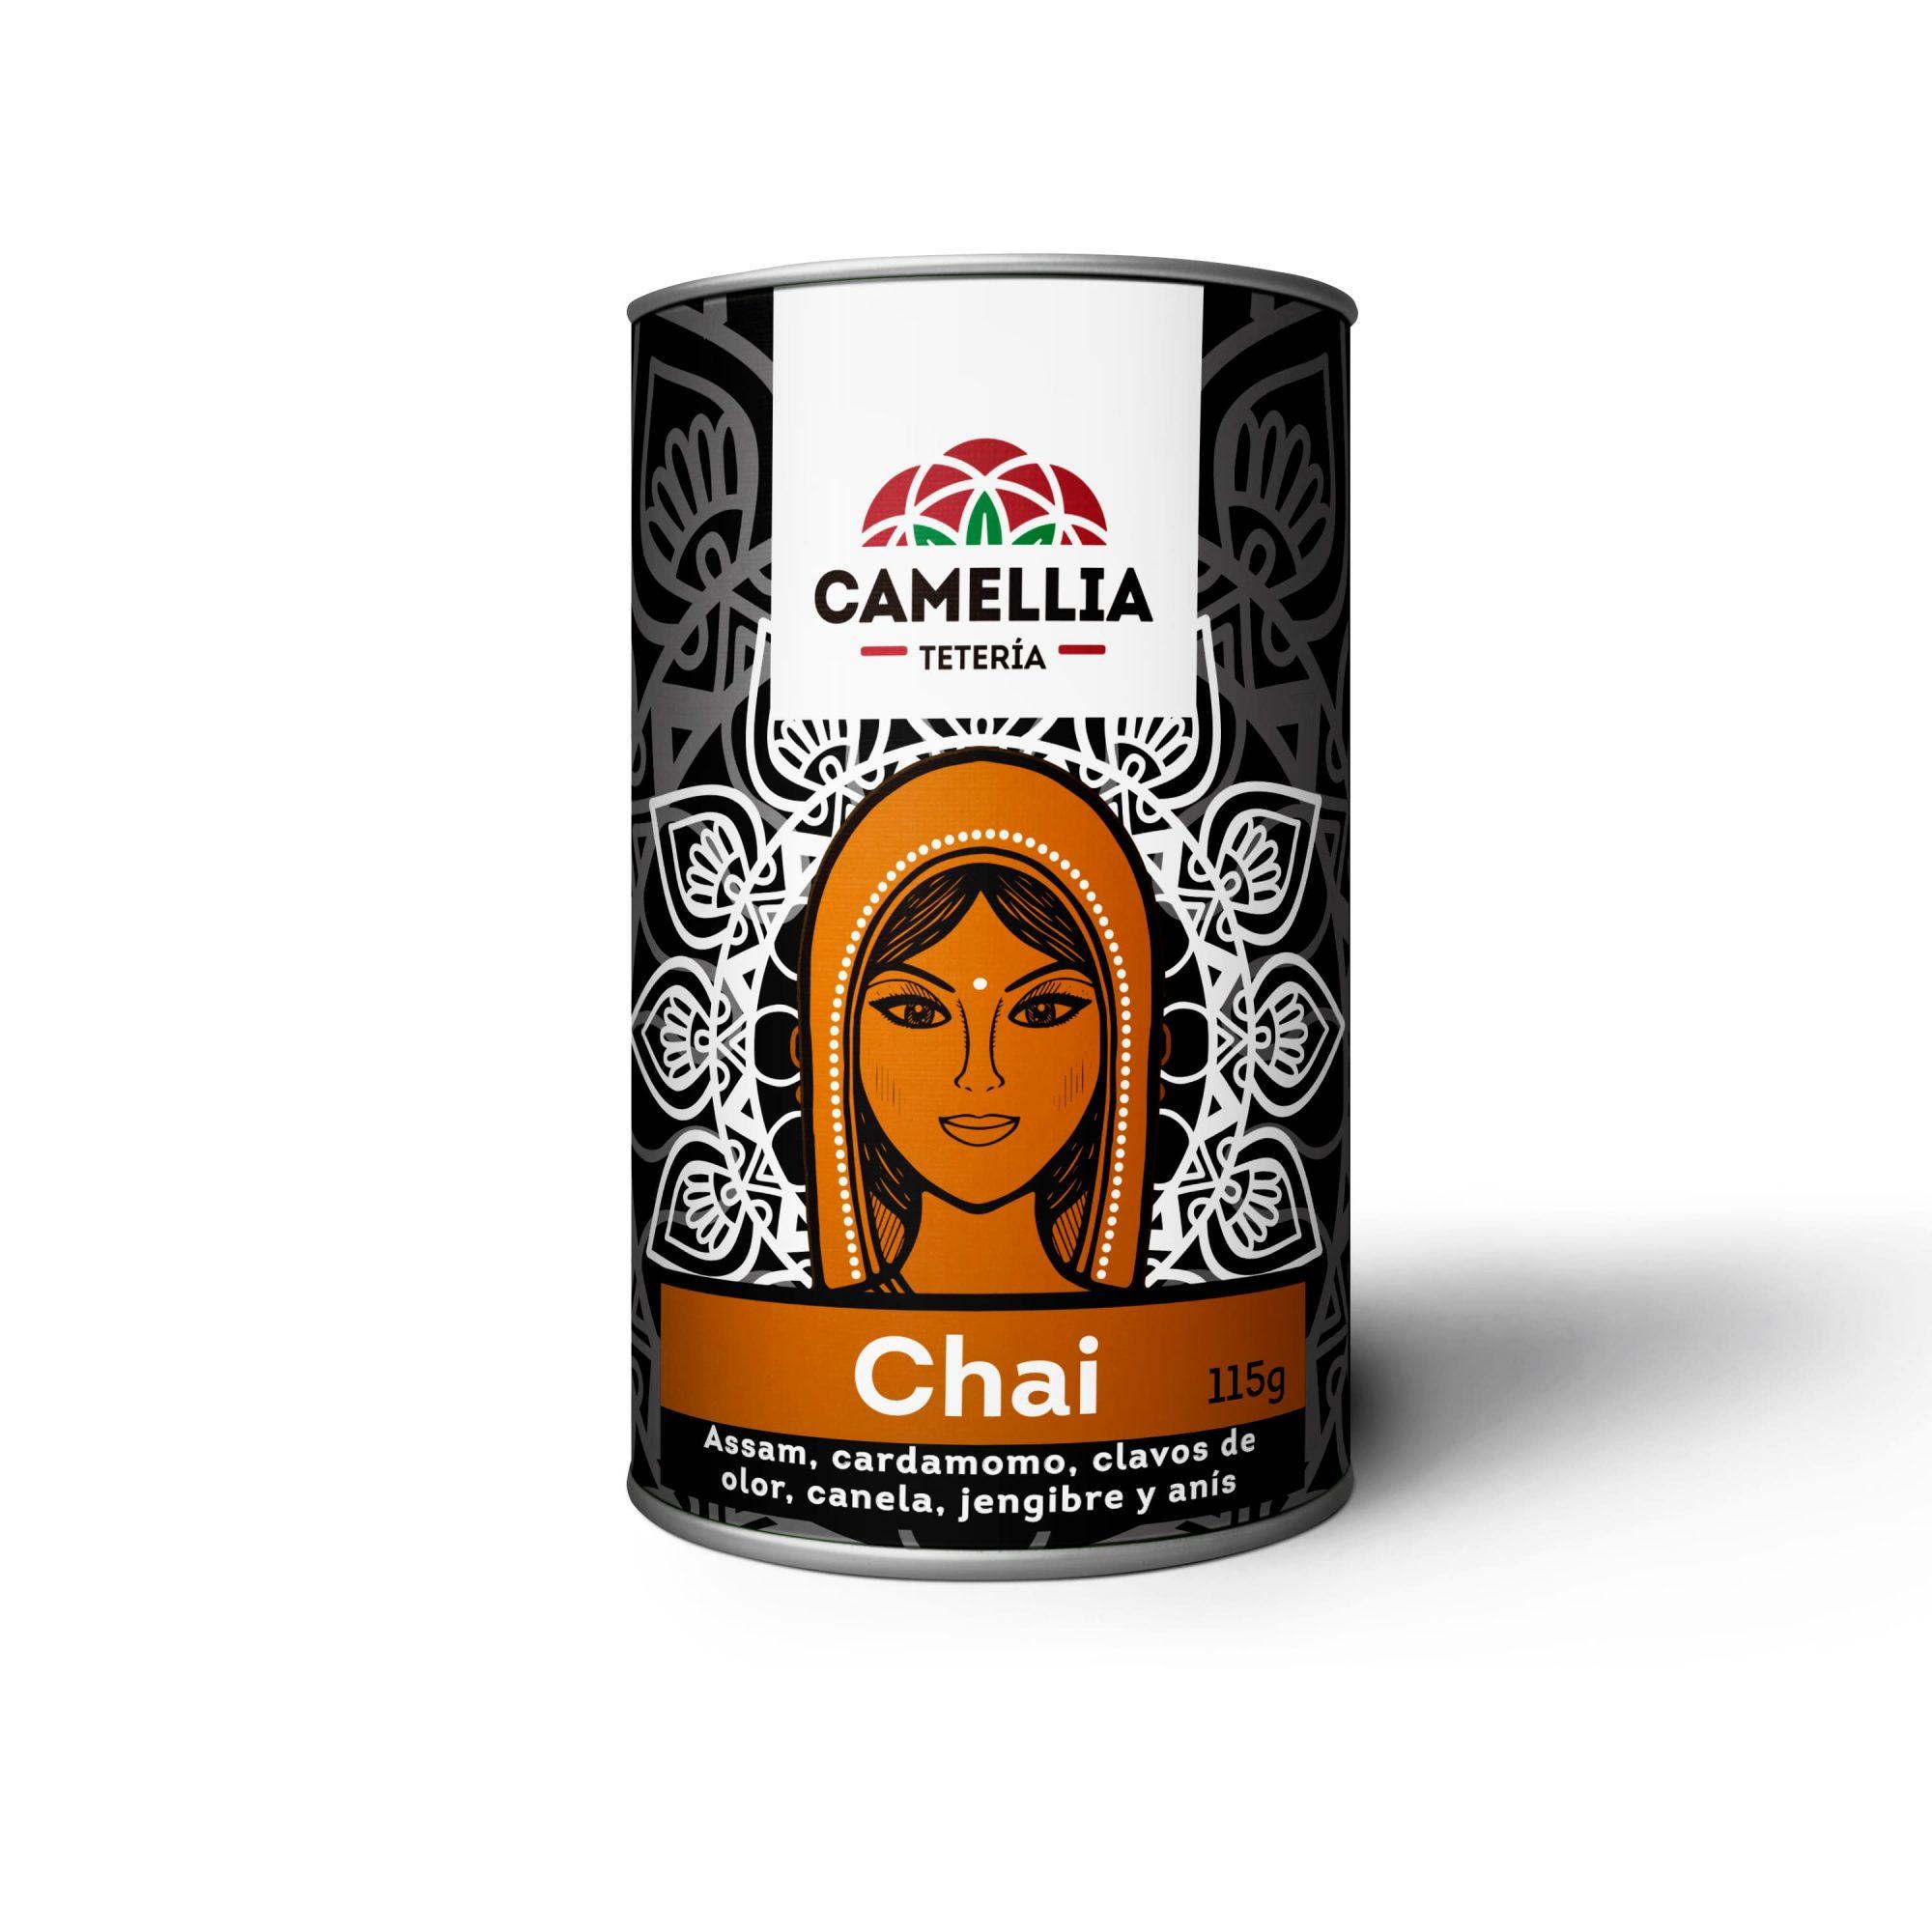 Chai té negro assam cardamomo anis clavos de olor jengibre canela